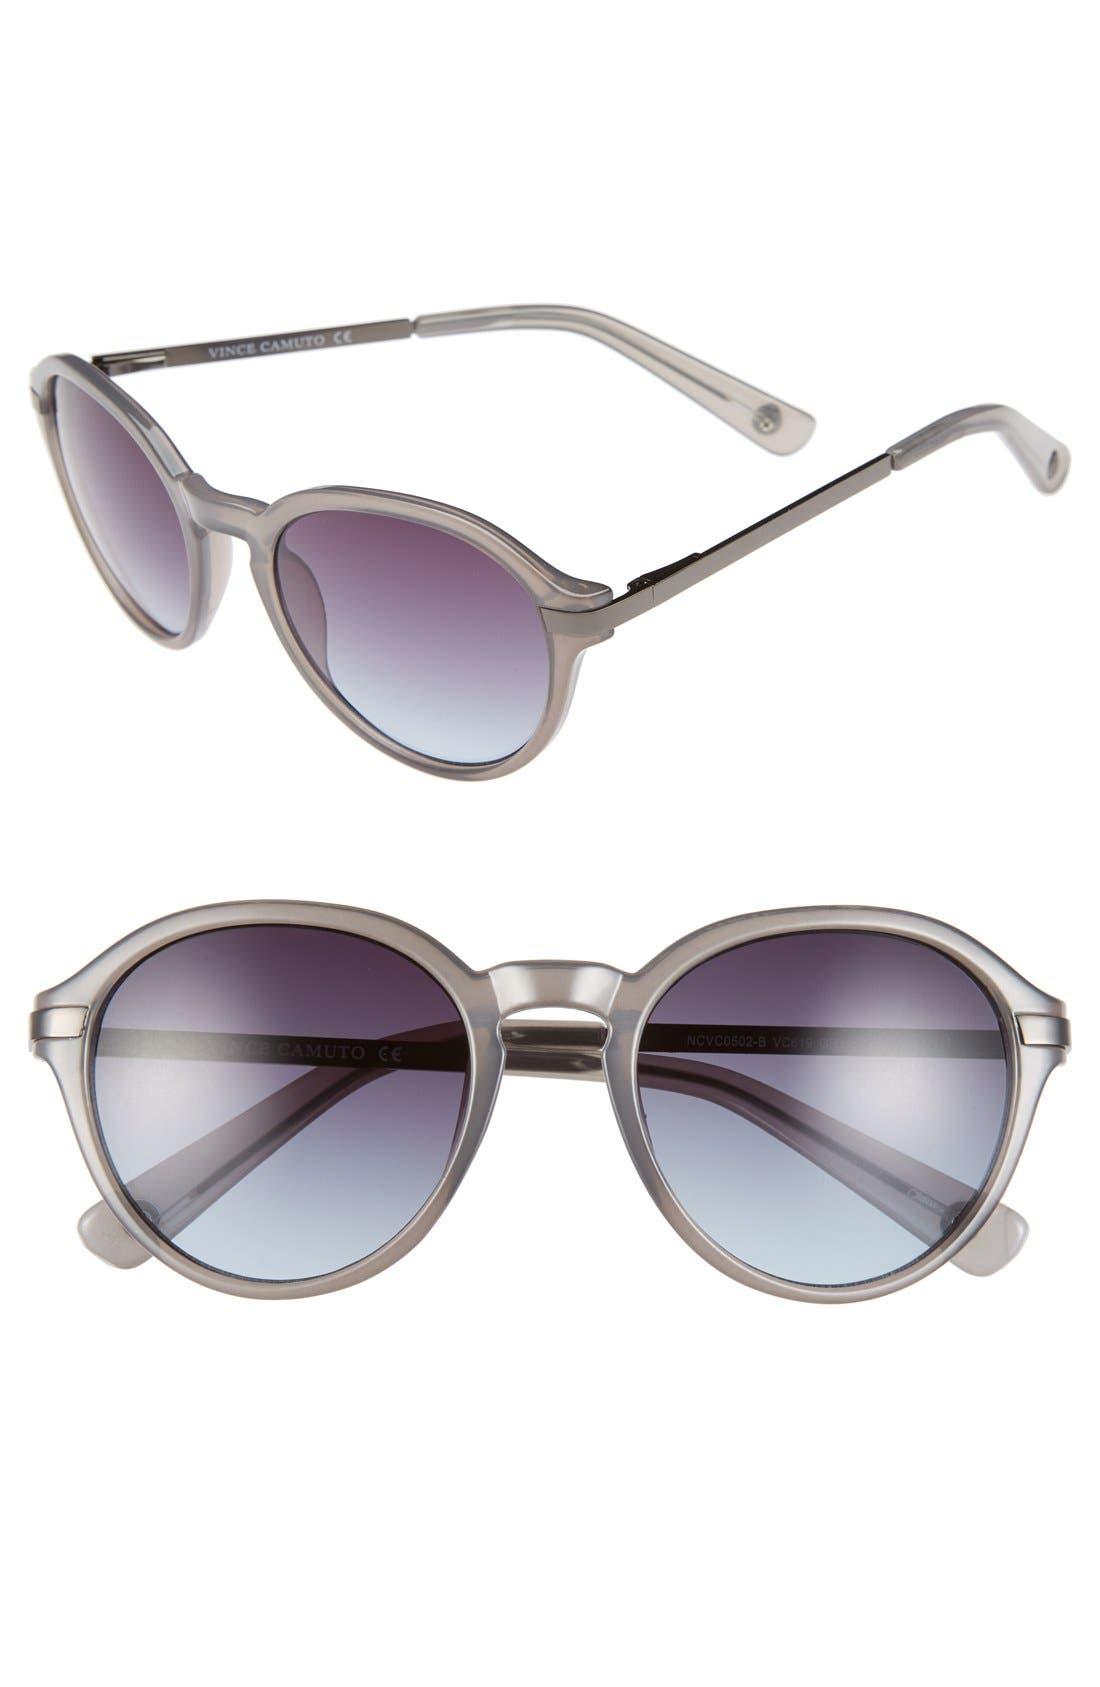 Main Image - Vince Camuto 52mm Round Sunglasses